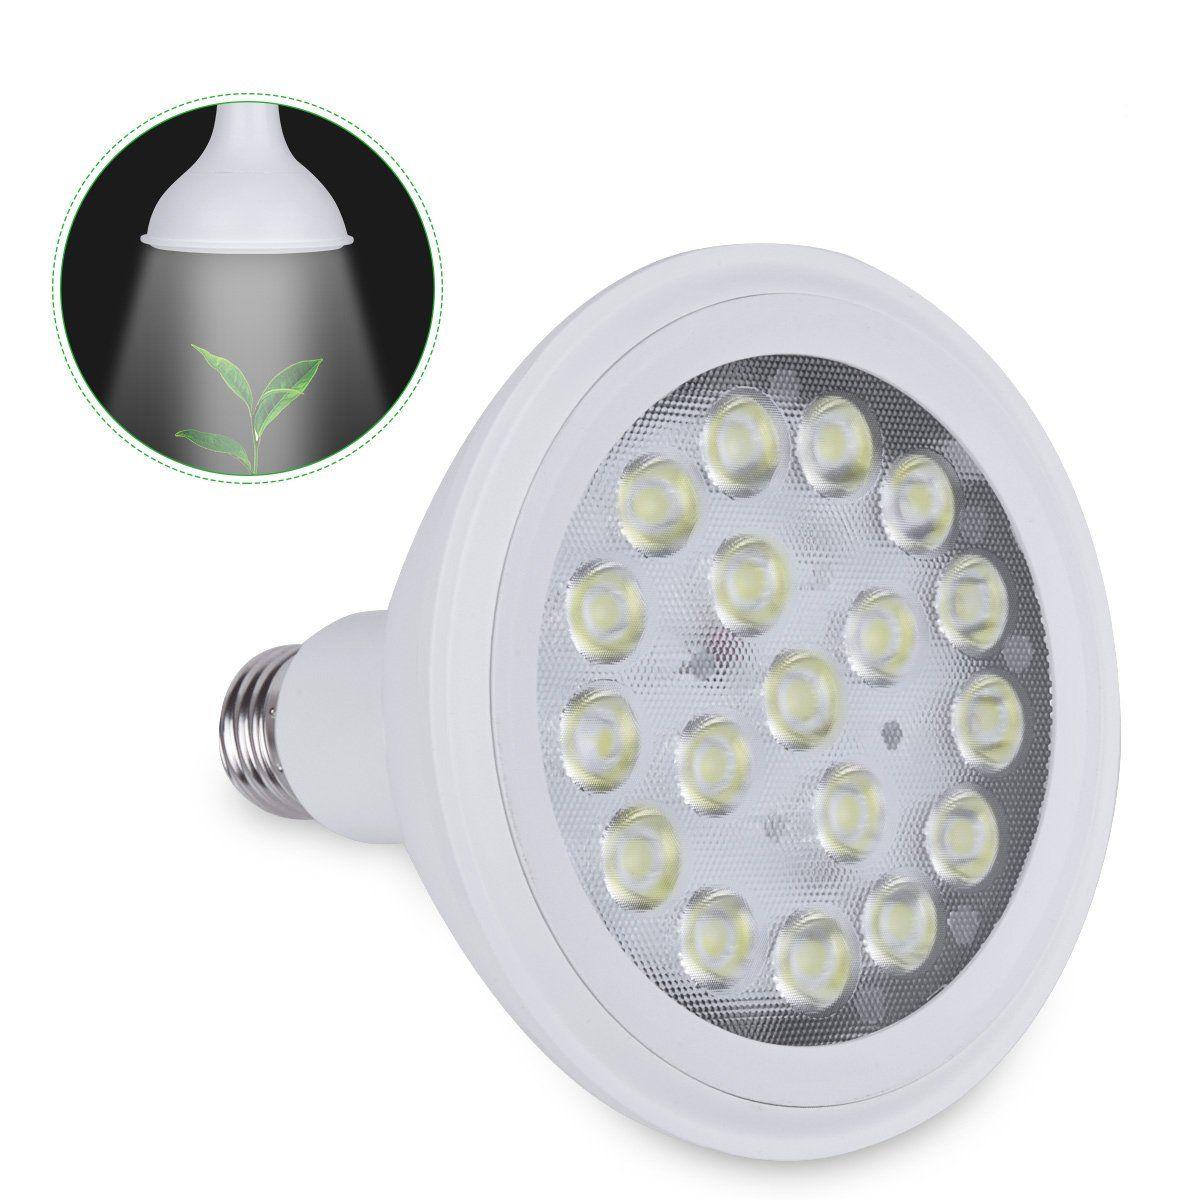 Timi Lighting Led Grow Lamp Bulb 18w Plant Grow Lights For Indoor Plants Hydroponics Greenhouse Organic Vegetables Floweri In 2020 Led Grow Light Bulbs Grow Light Bulbs